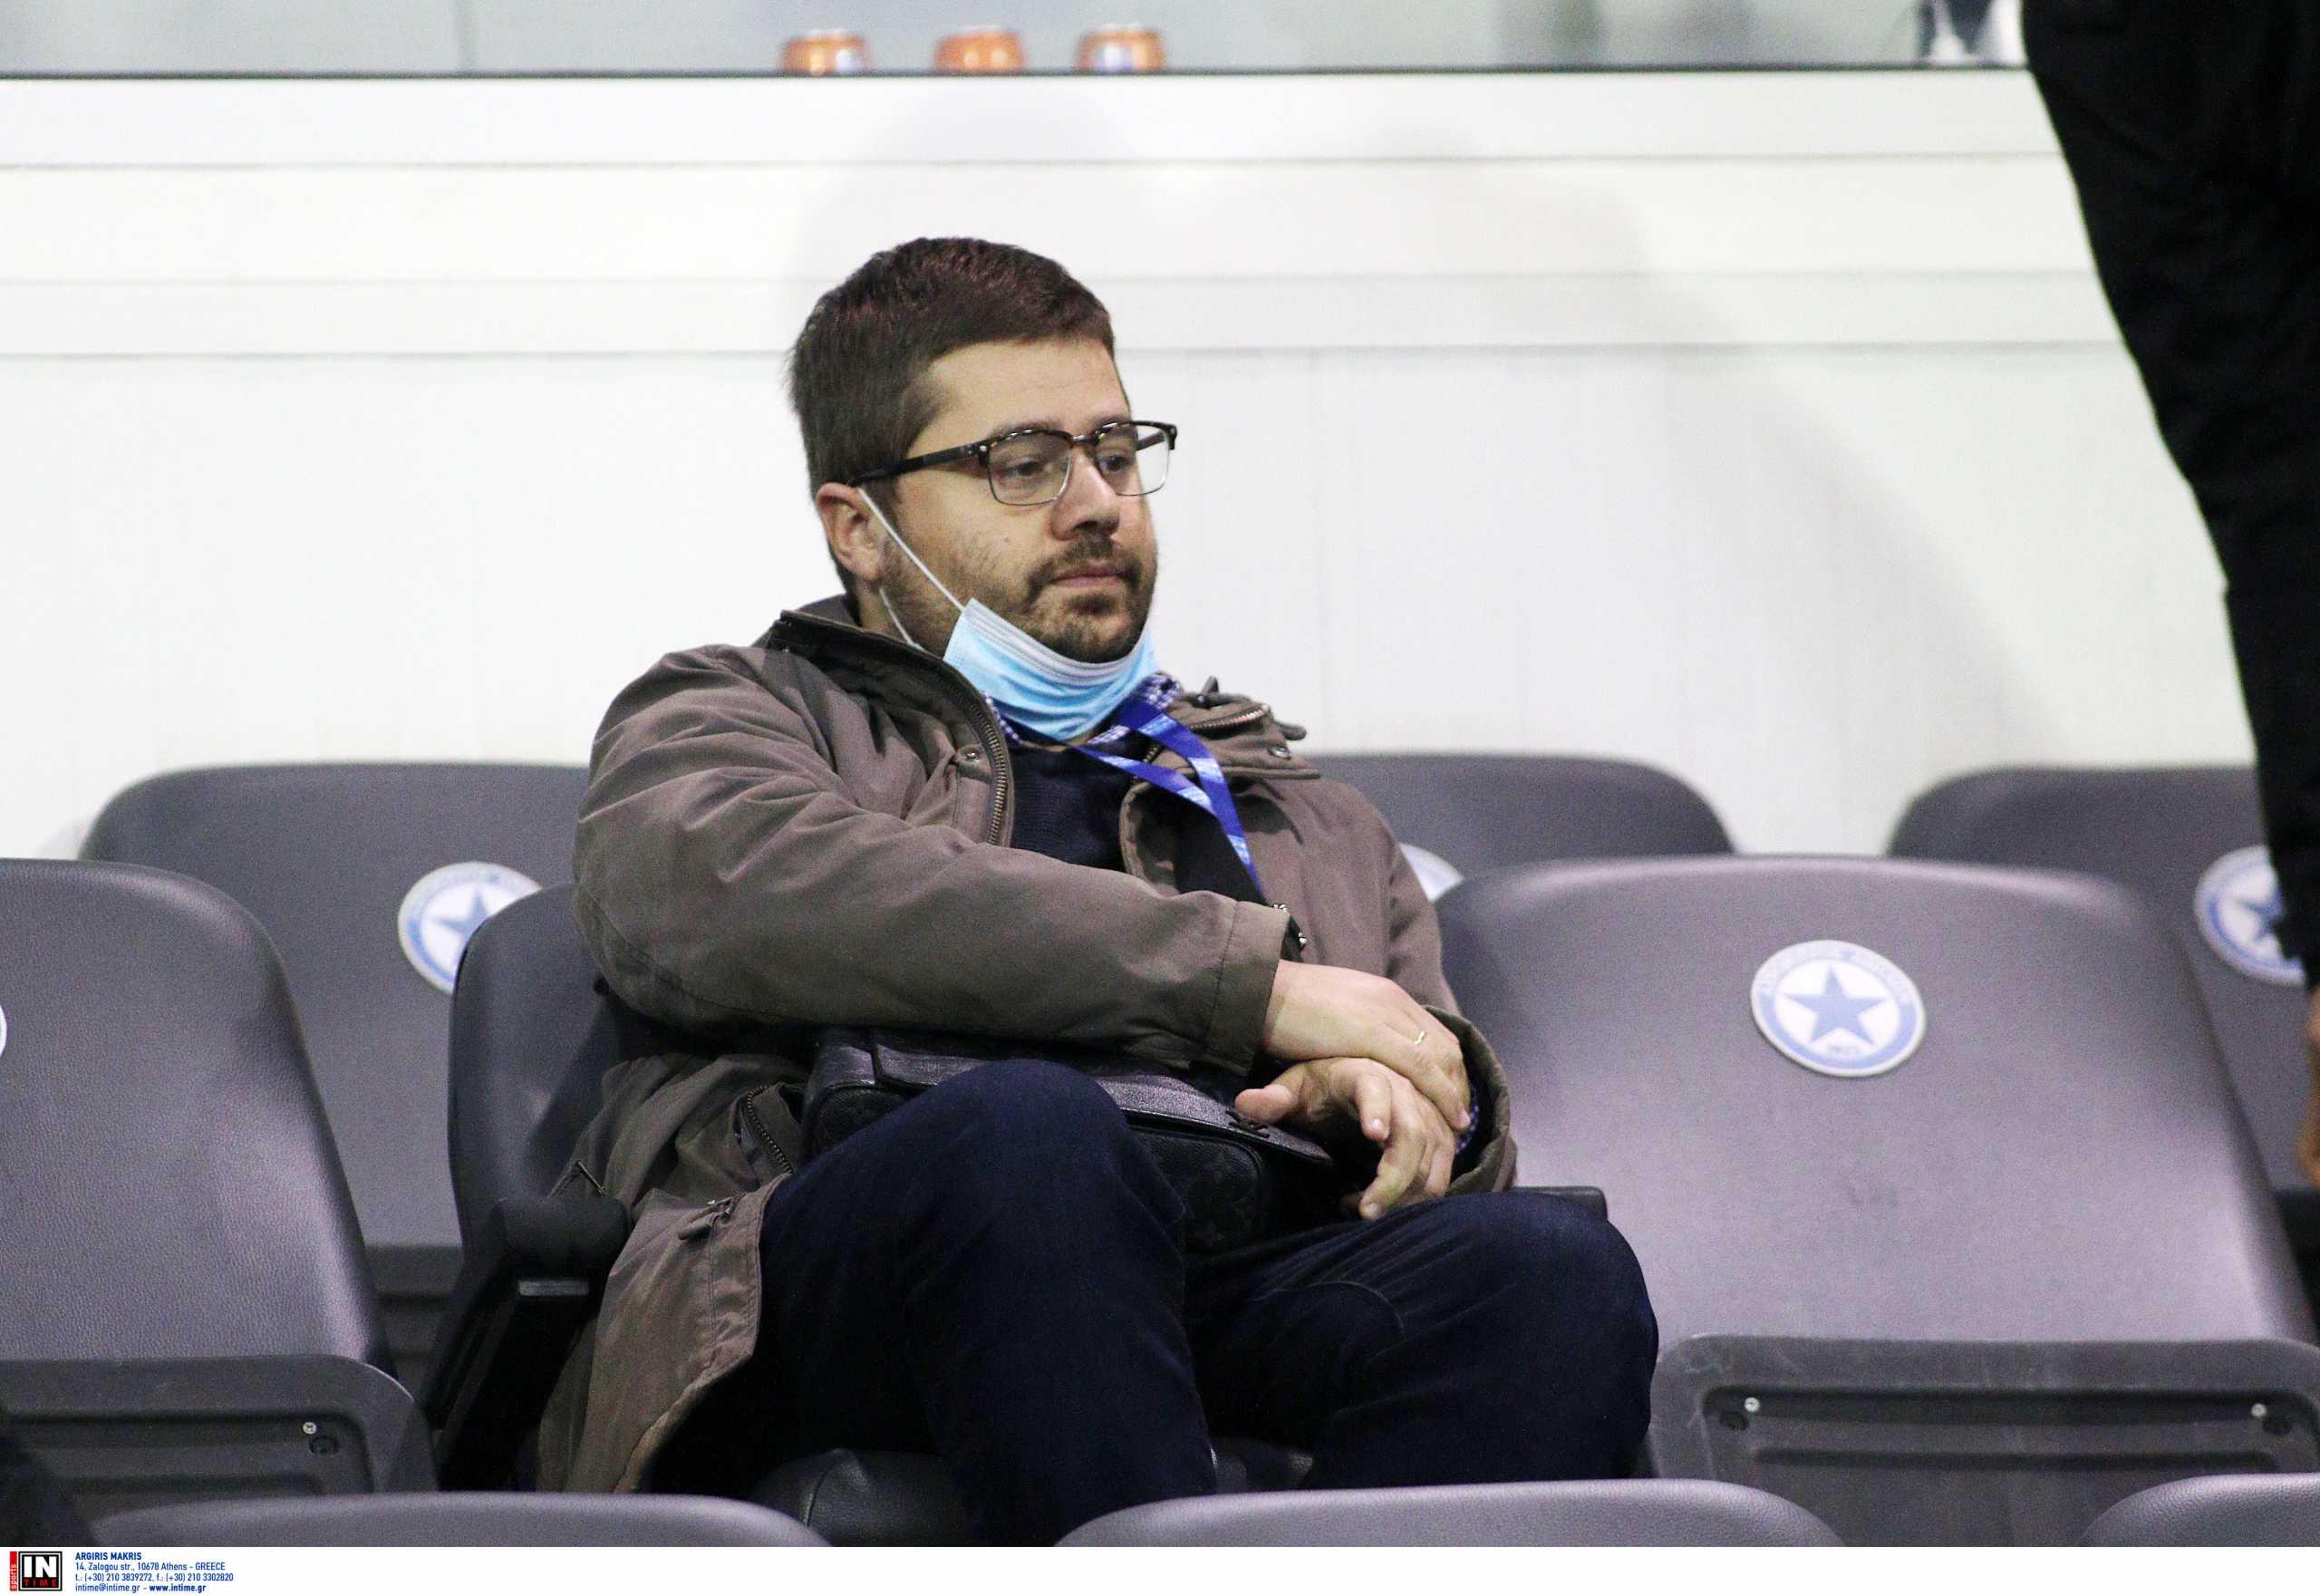 Superleague: Φαβορί ο Μάκης Γκαγκάτσης για τη θέση του προέδρου